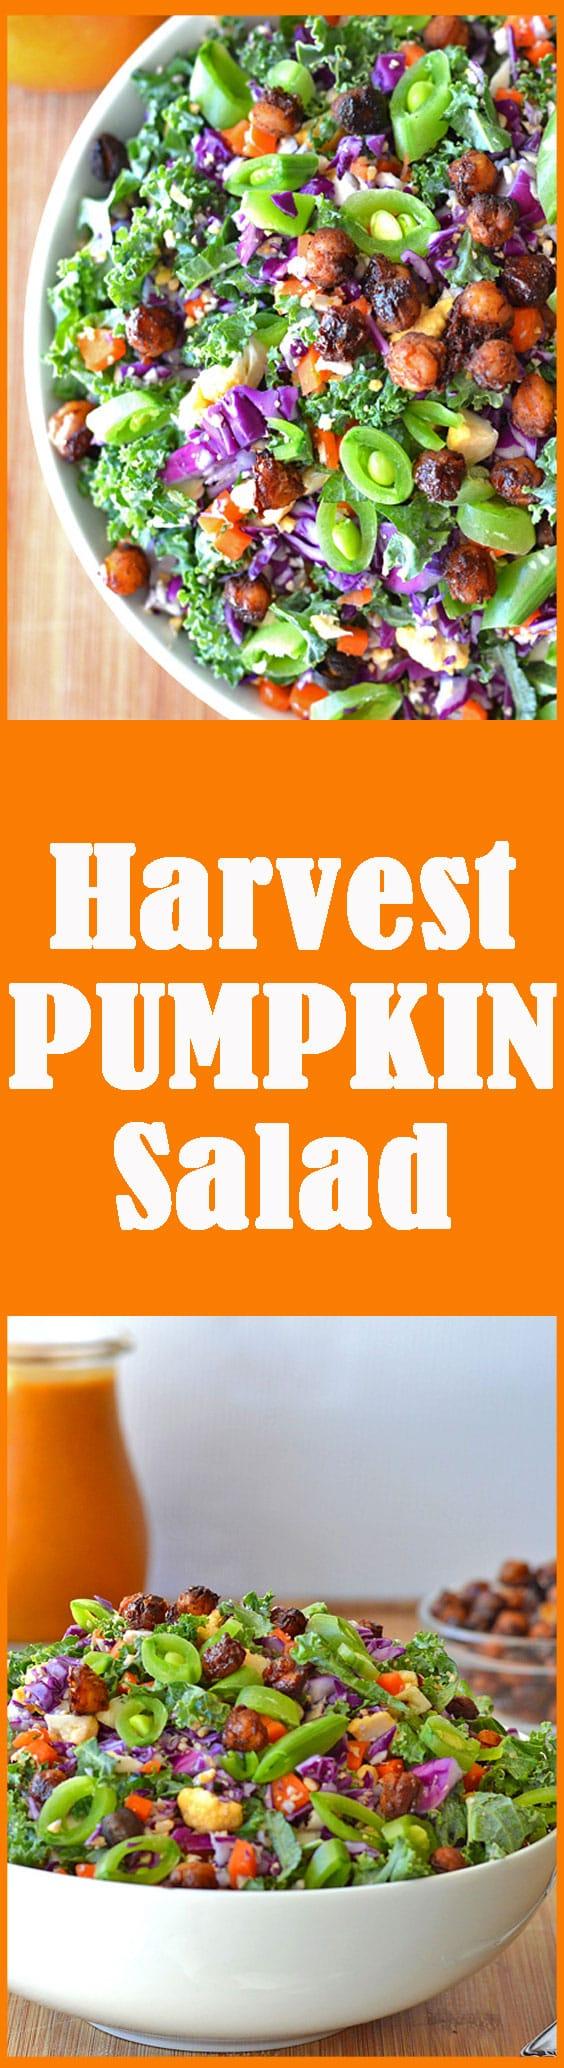 Harvest Pumpkin Salad